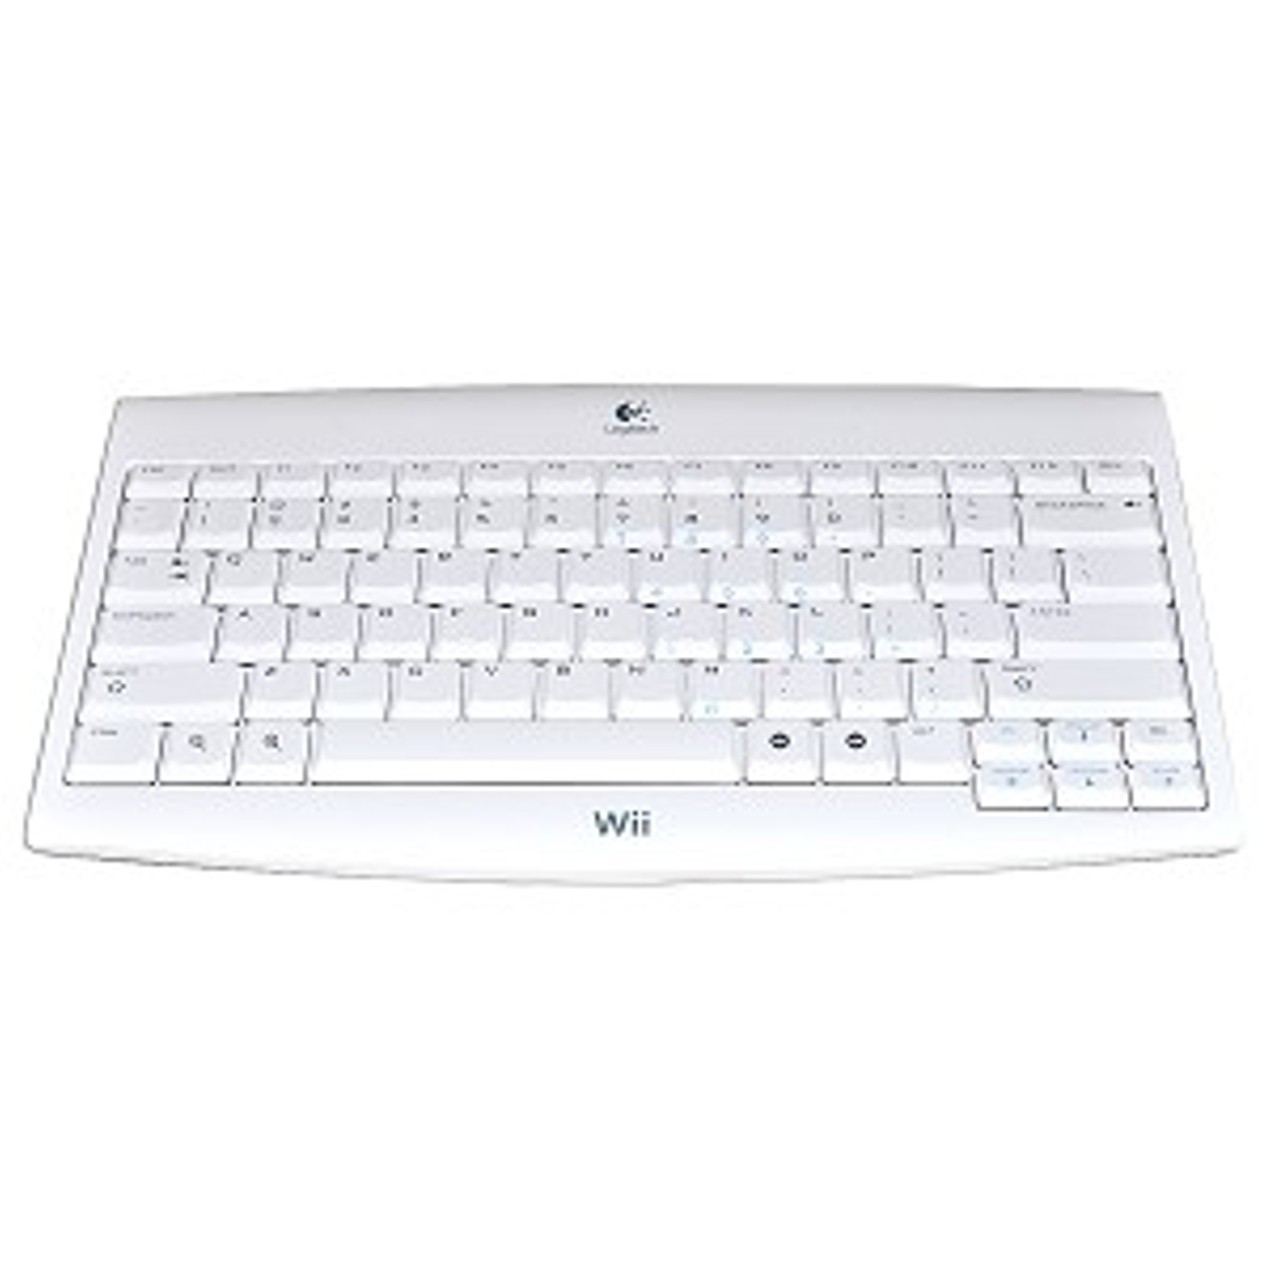 9a92e859a54 Logitech 81-Key Wireless Keyboard for Nintendo Wii - Tanga